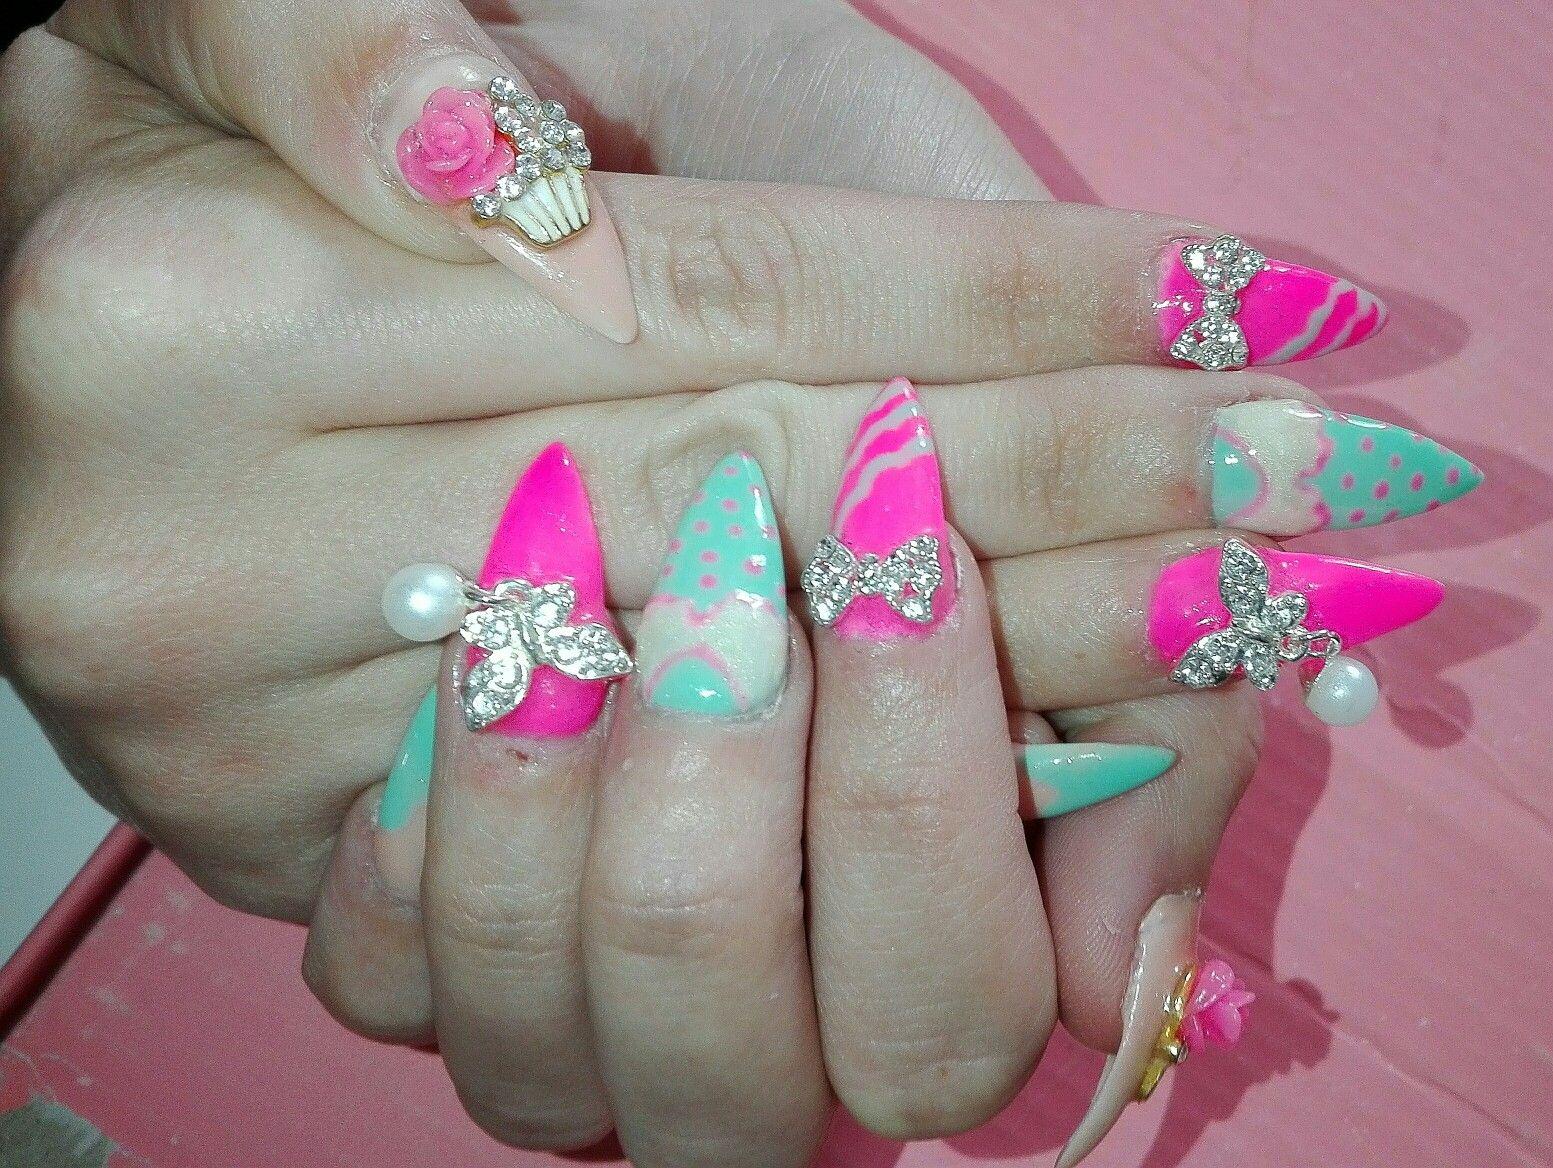 Pin by vera belchior on nail art pinterest